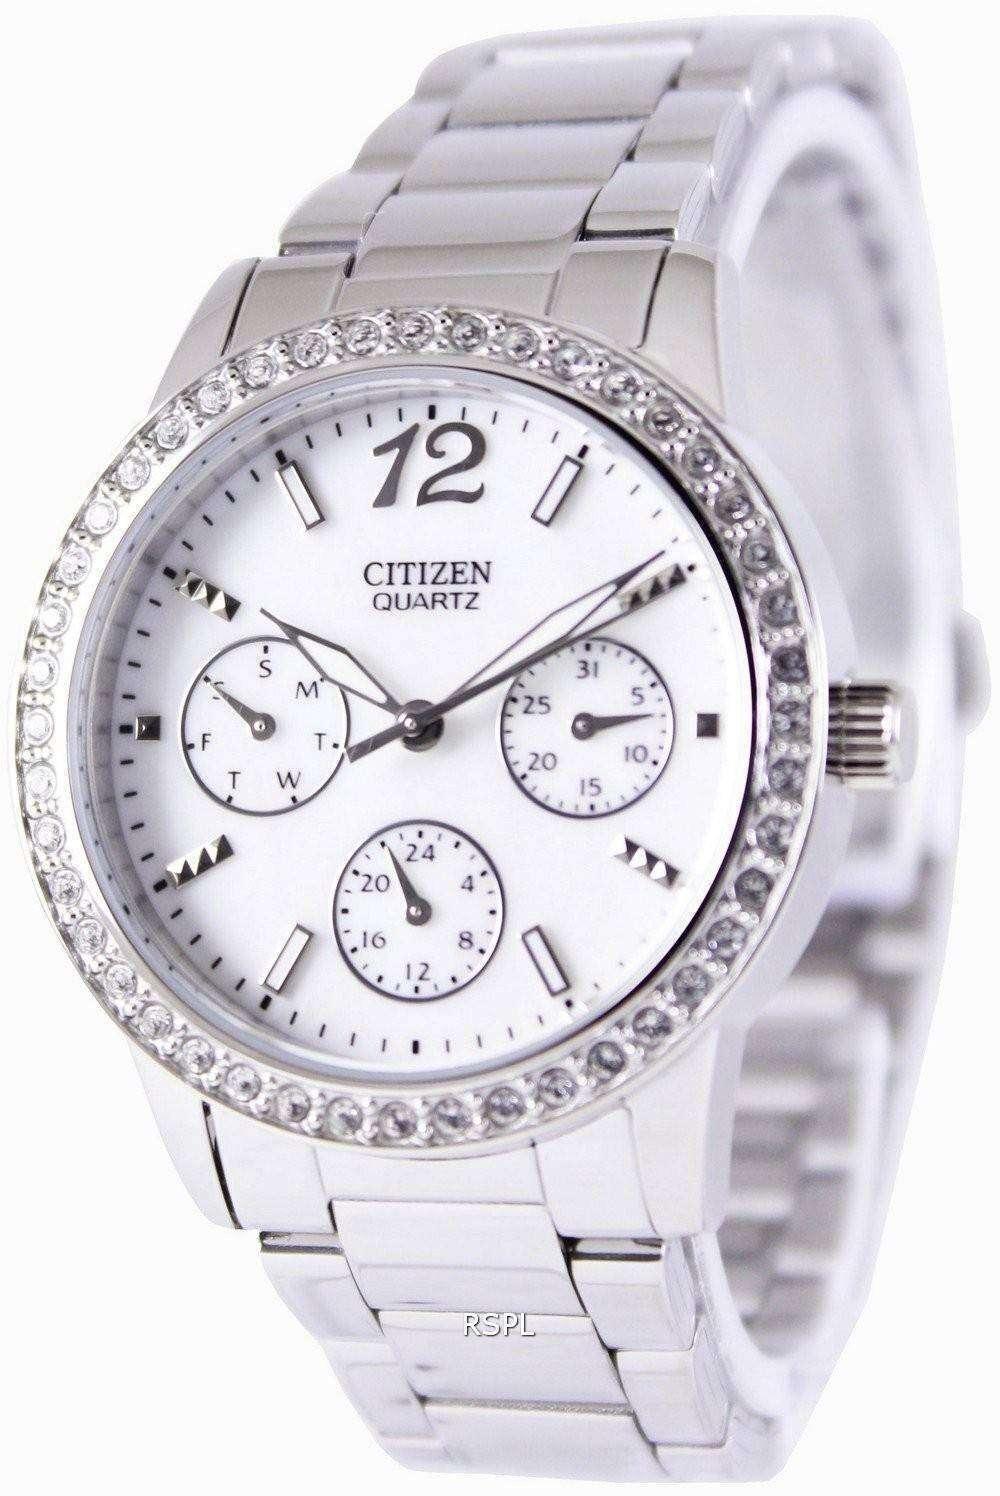 Citizen quartz swarovski crystals ed8090 53d womens watch for Swarovski crystals watch